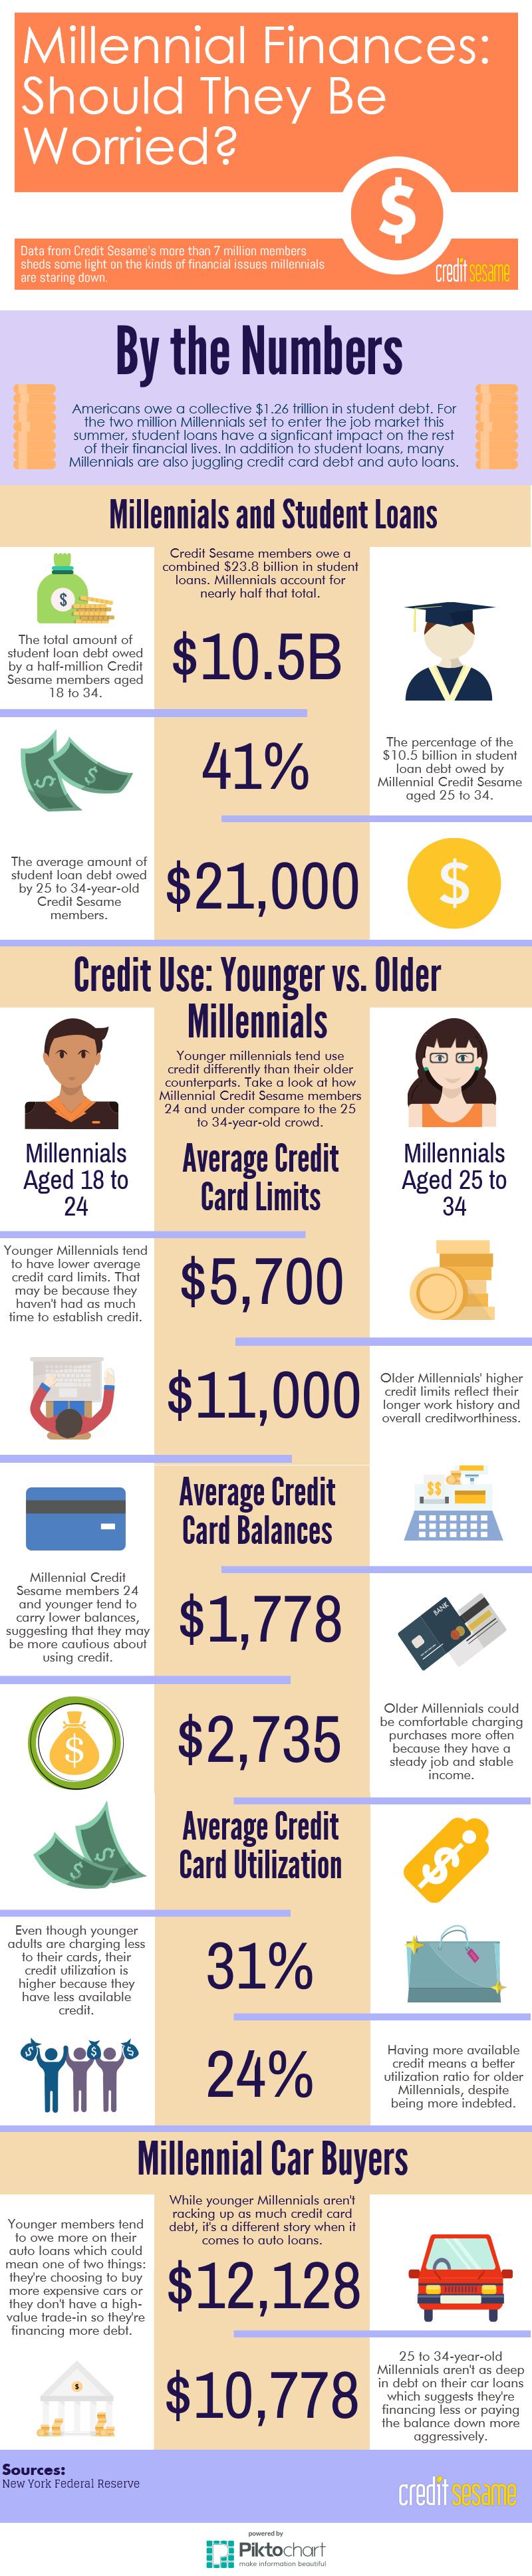 student-loans-and-millennials_(4)